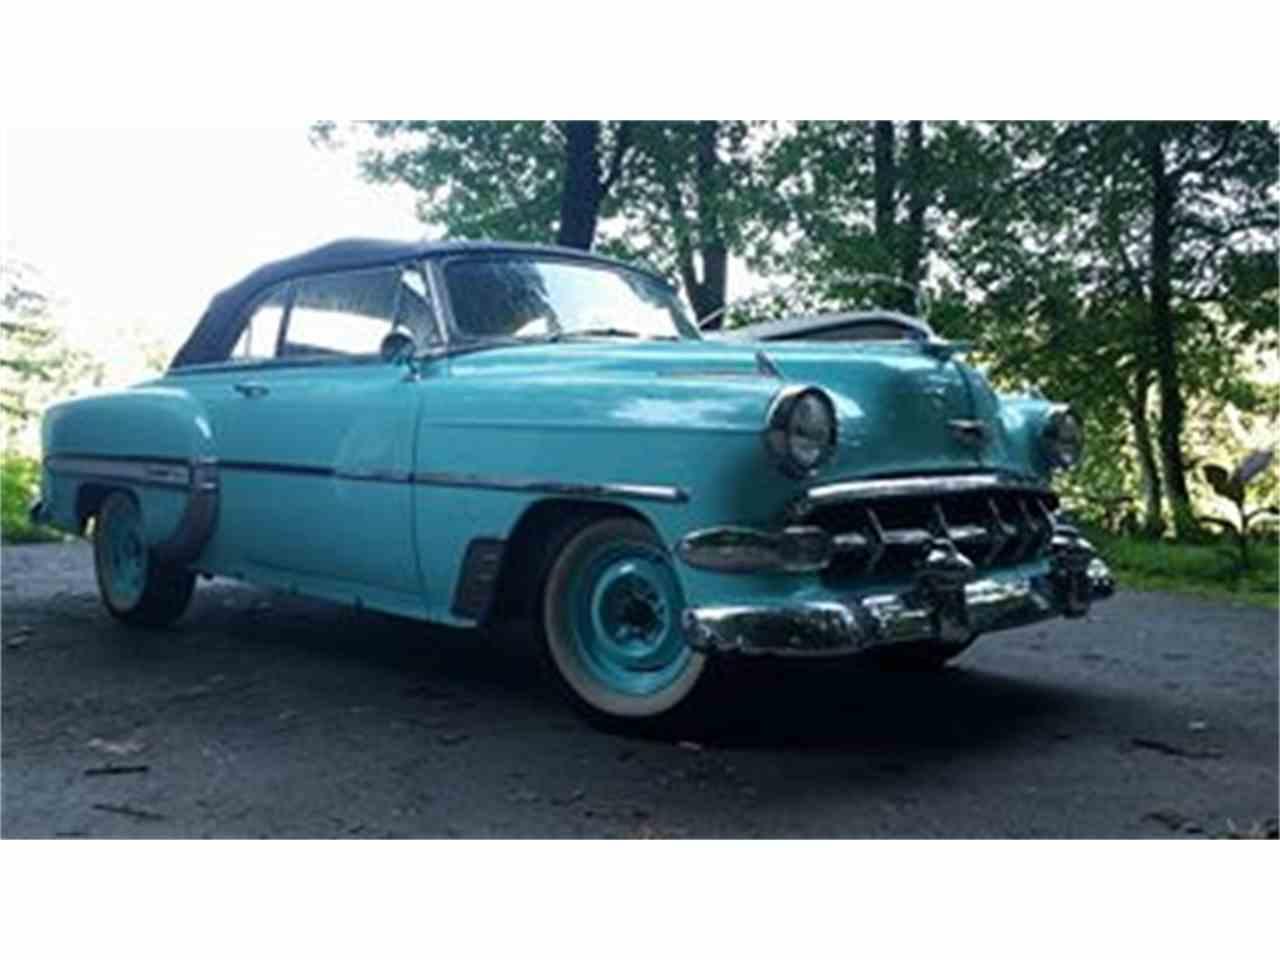 All Chevy 1954 chevrolet belair : 1954 Chevrolet Bel Air for Sale | ClassicCars.com | CC-895258